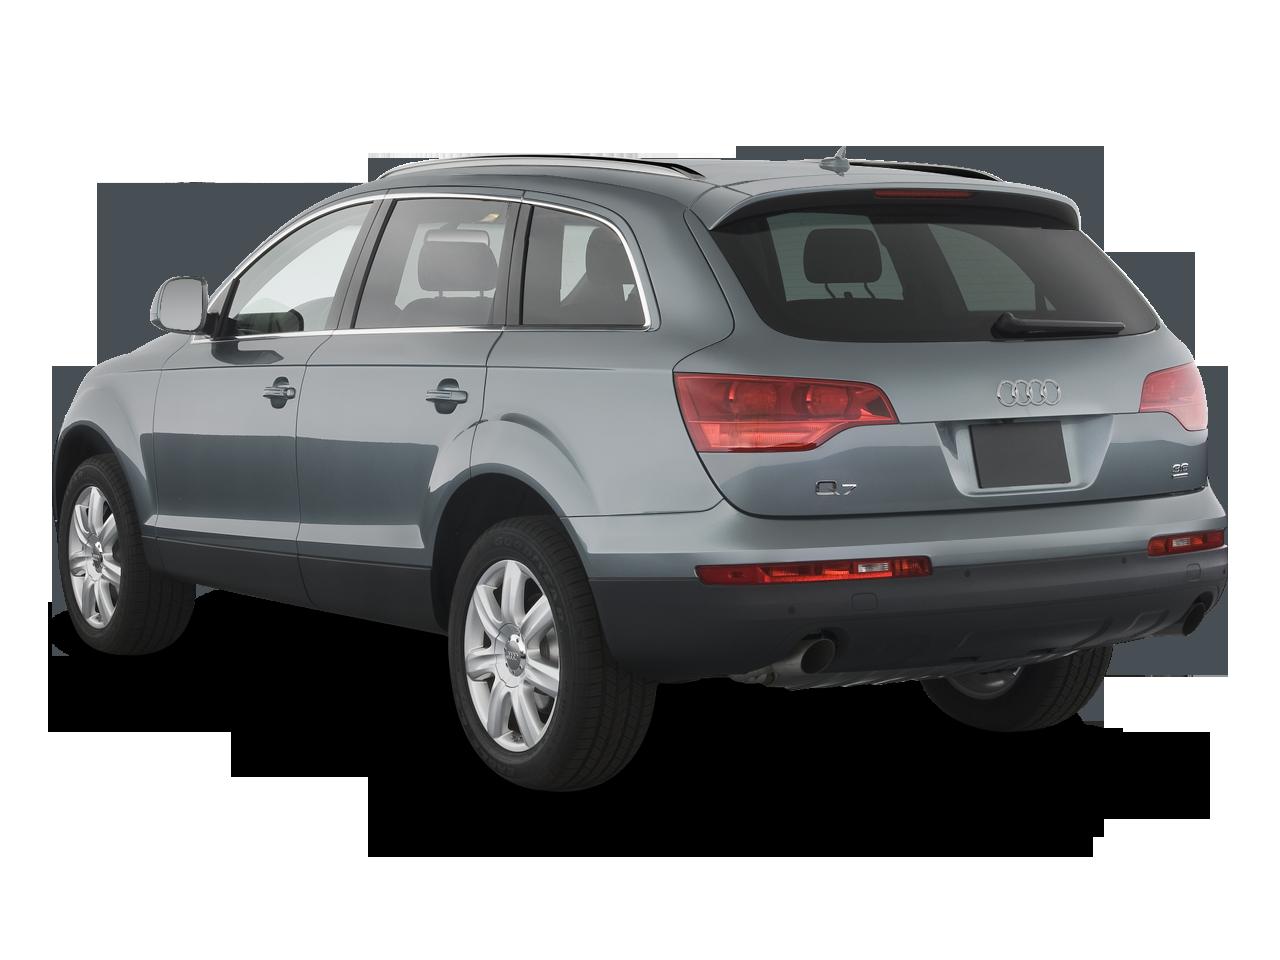 2009 audi q7 3 0 tdi quattro fuel efficient news car features and reviews automobile magazine. Black Bedroom Furniture Sets. Home Design Ideas